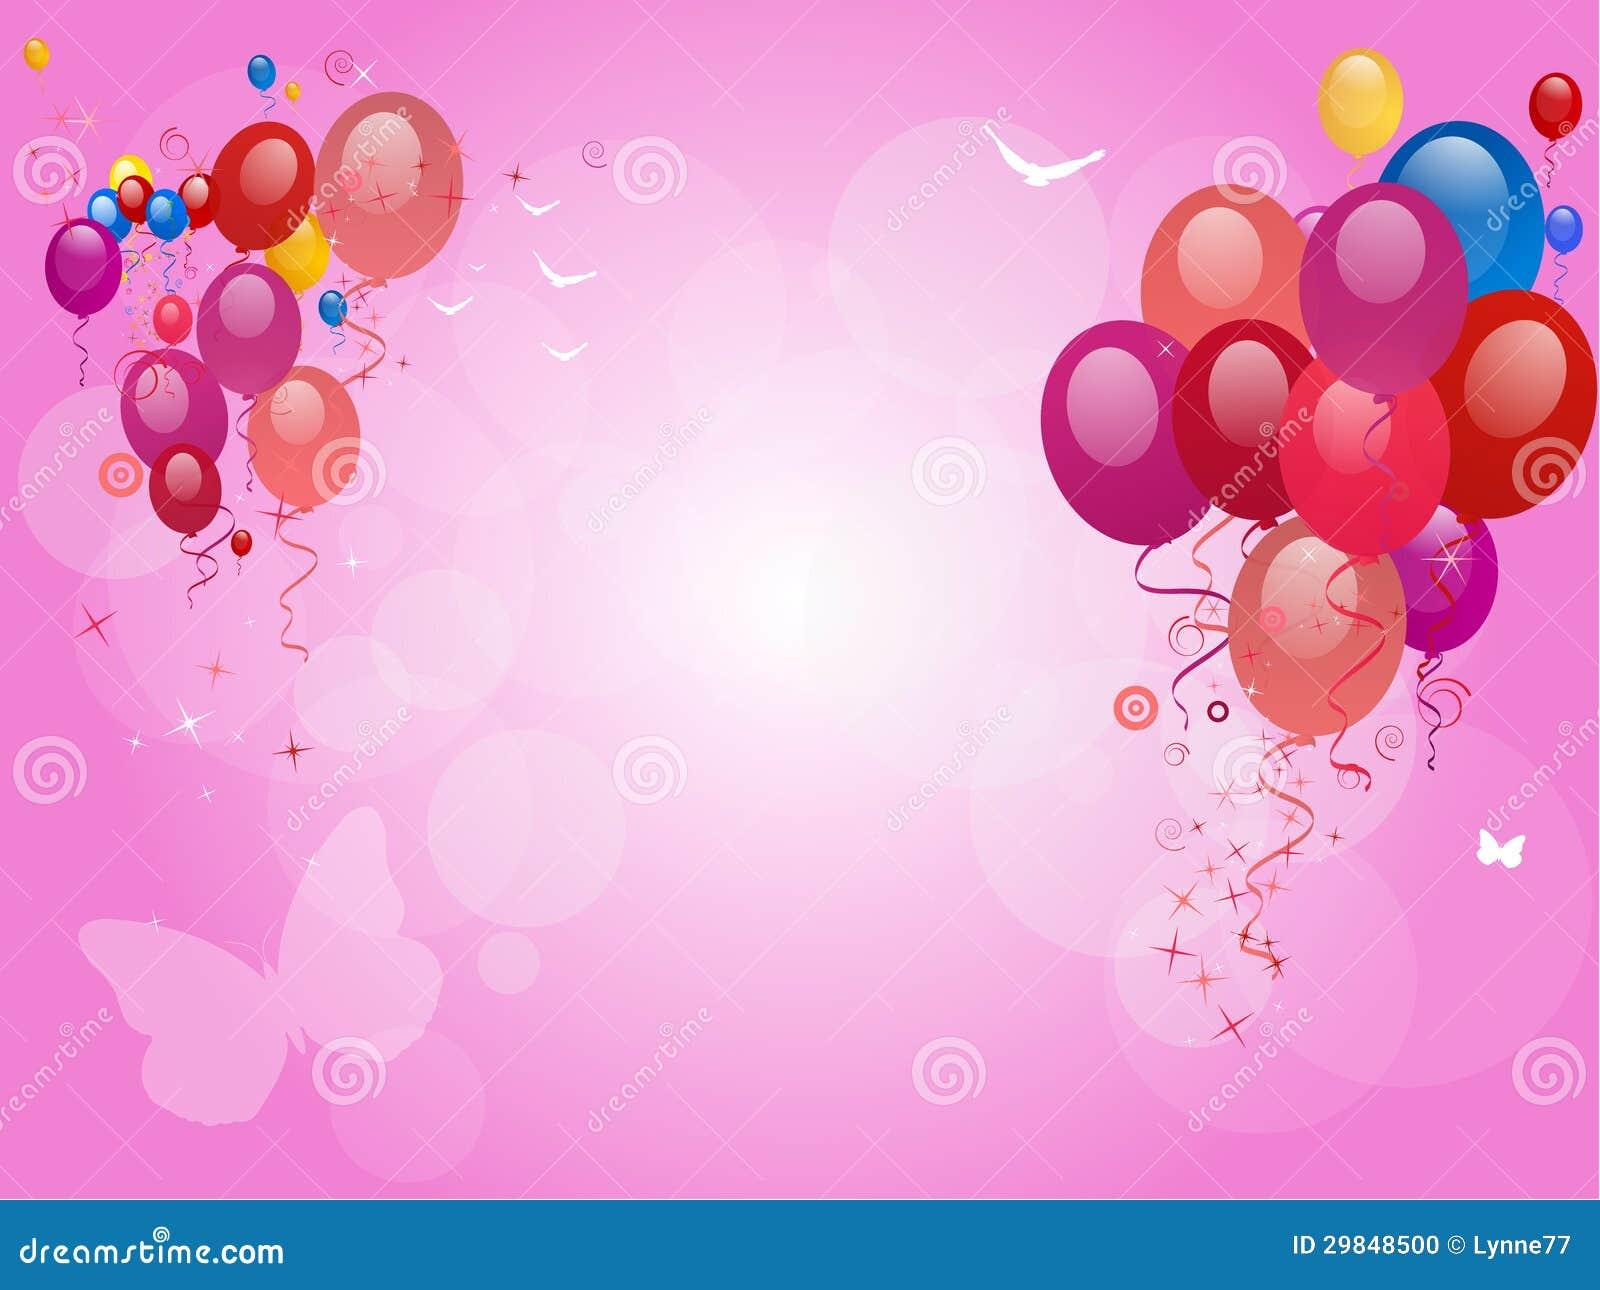 Pink Girl Background Stock Photo - Image: 29848500